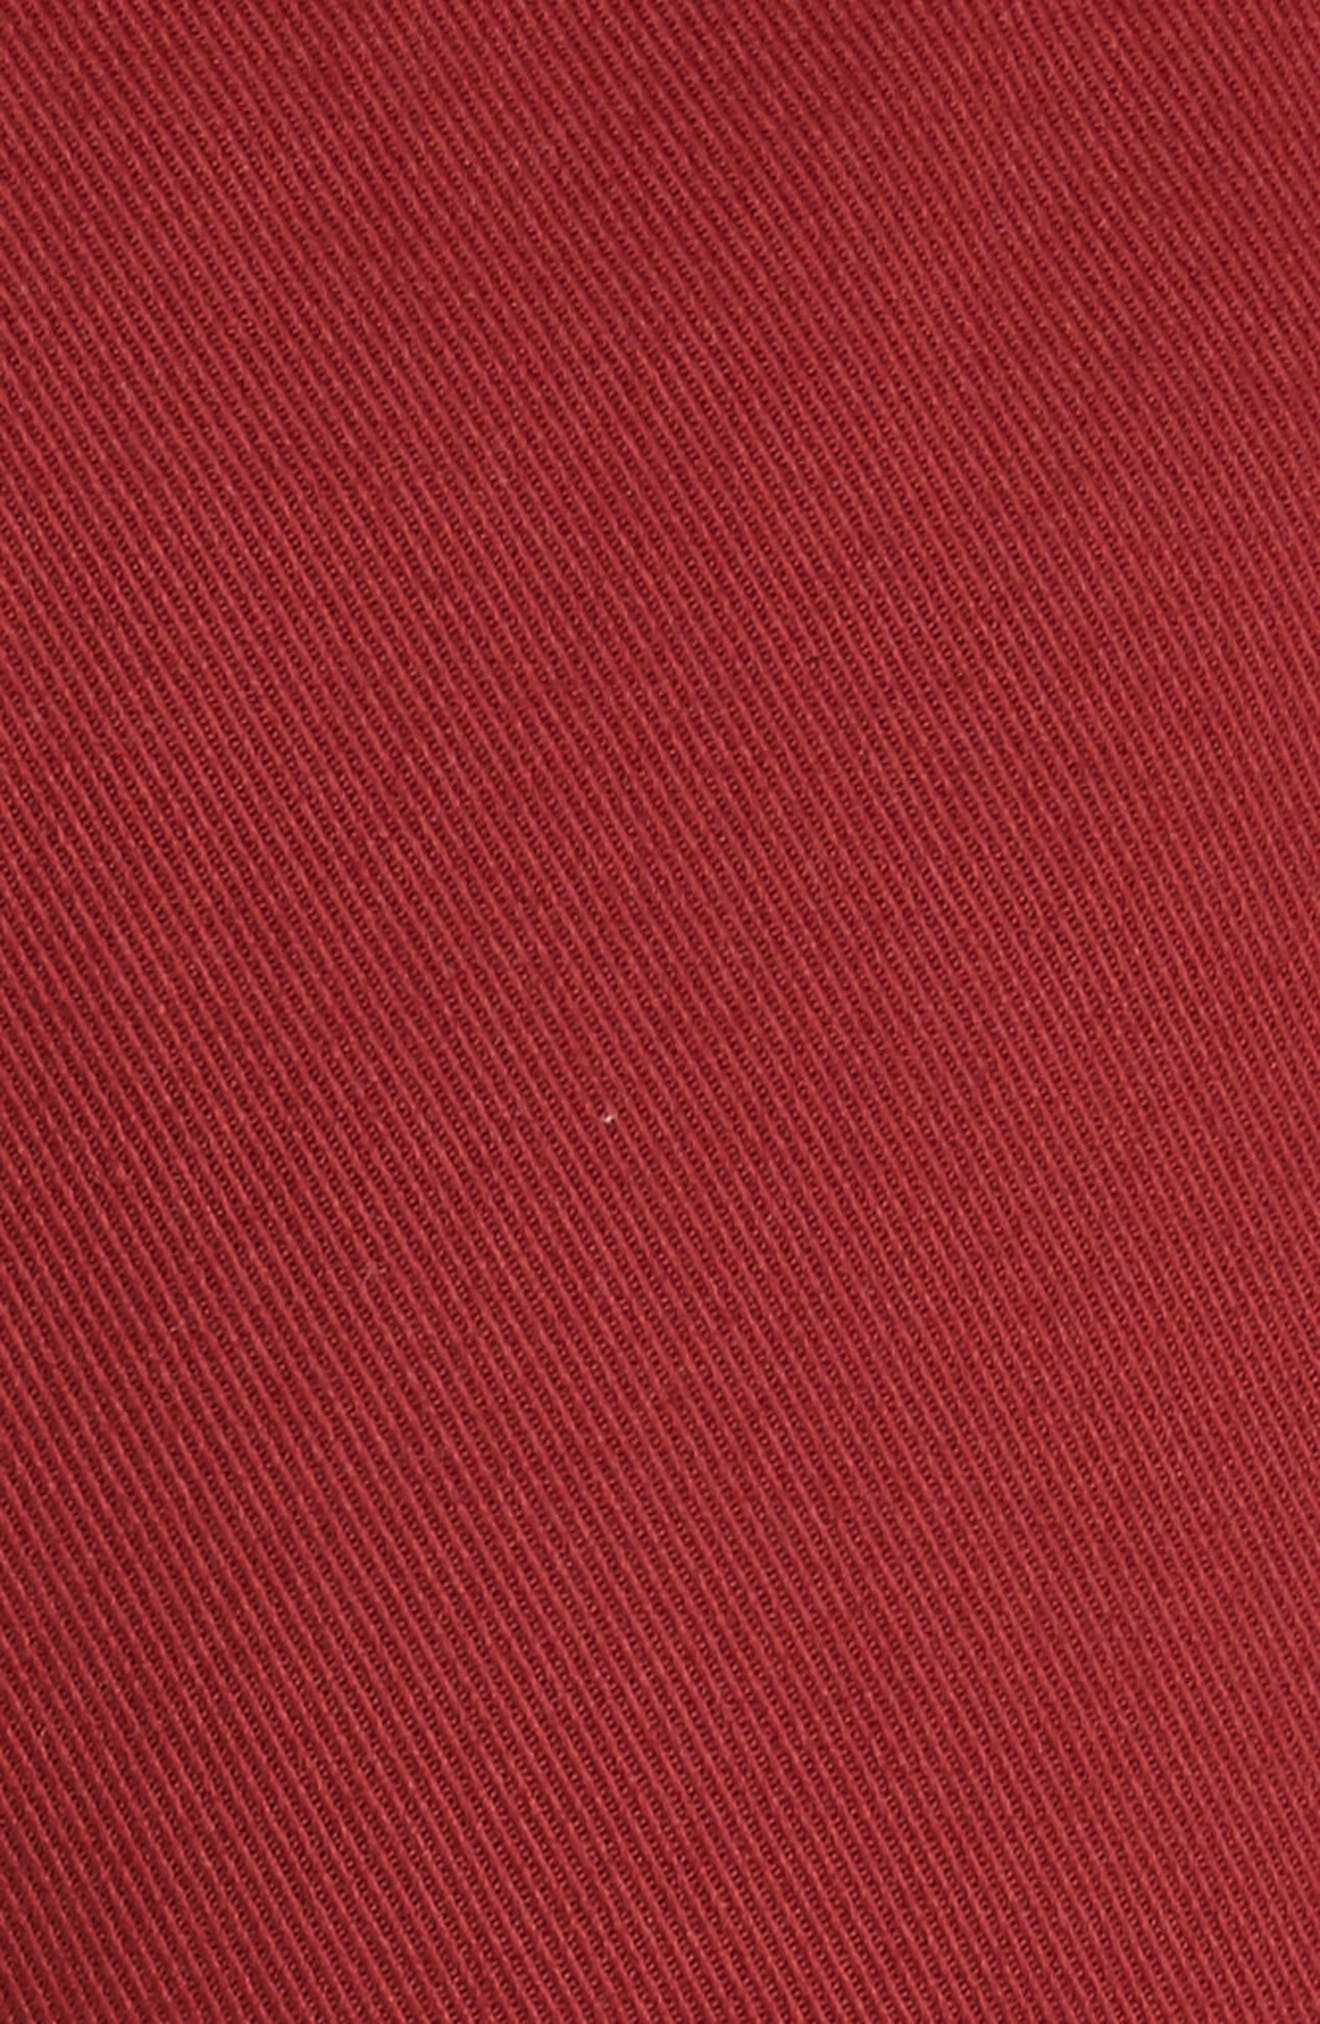 Ruffle Trim Drawstring Trousers,                             Alternate thumbnail 5, color,